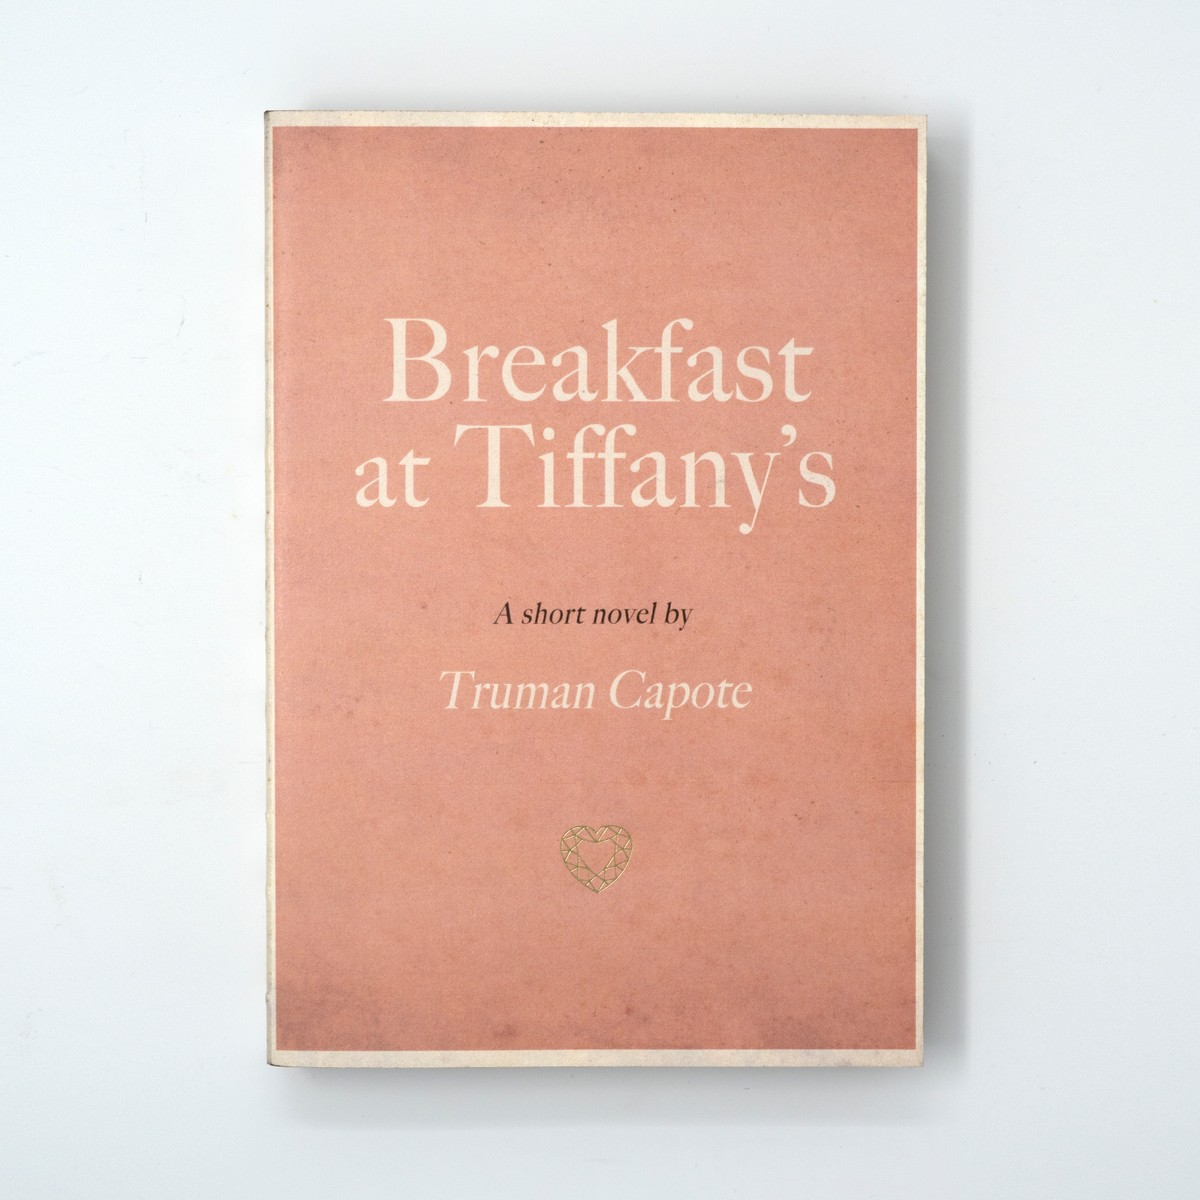 Photo of Breakfast at Tiffany's Notebook